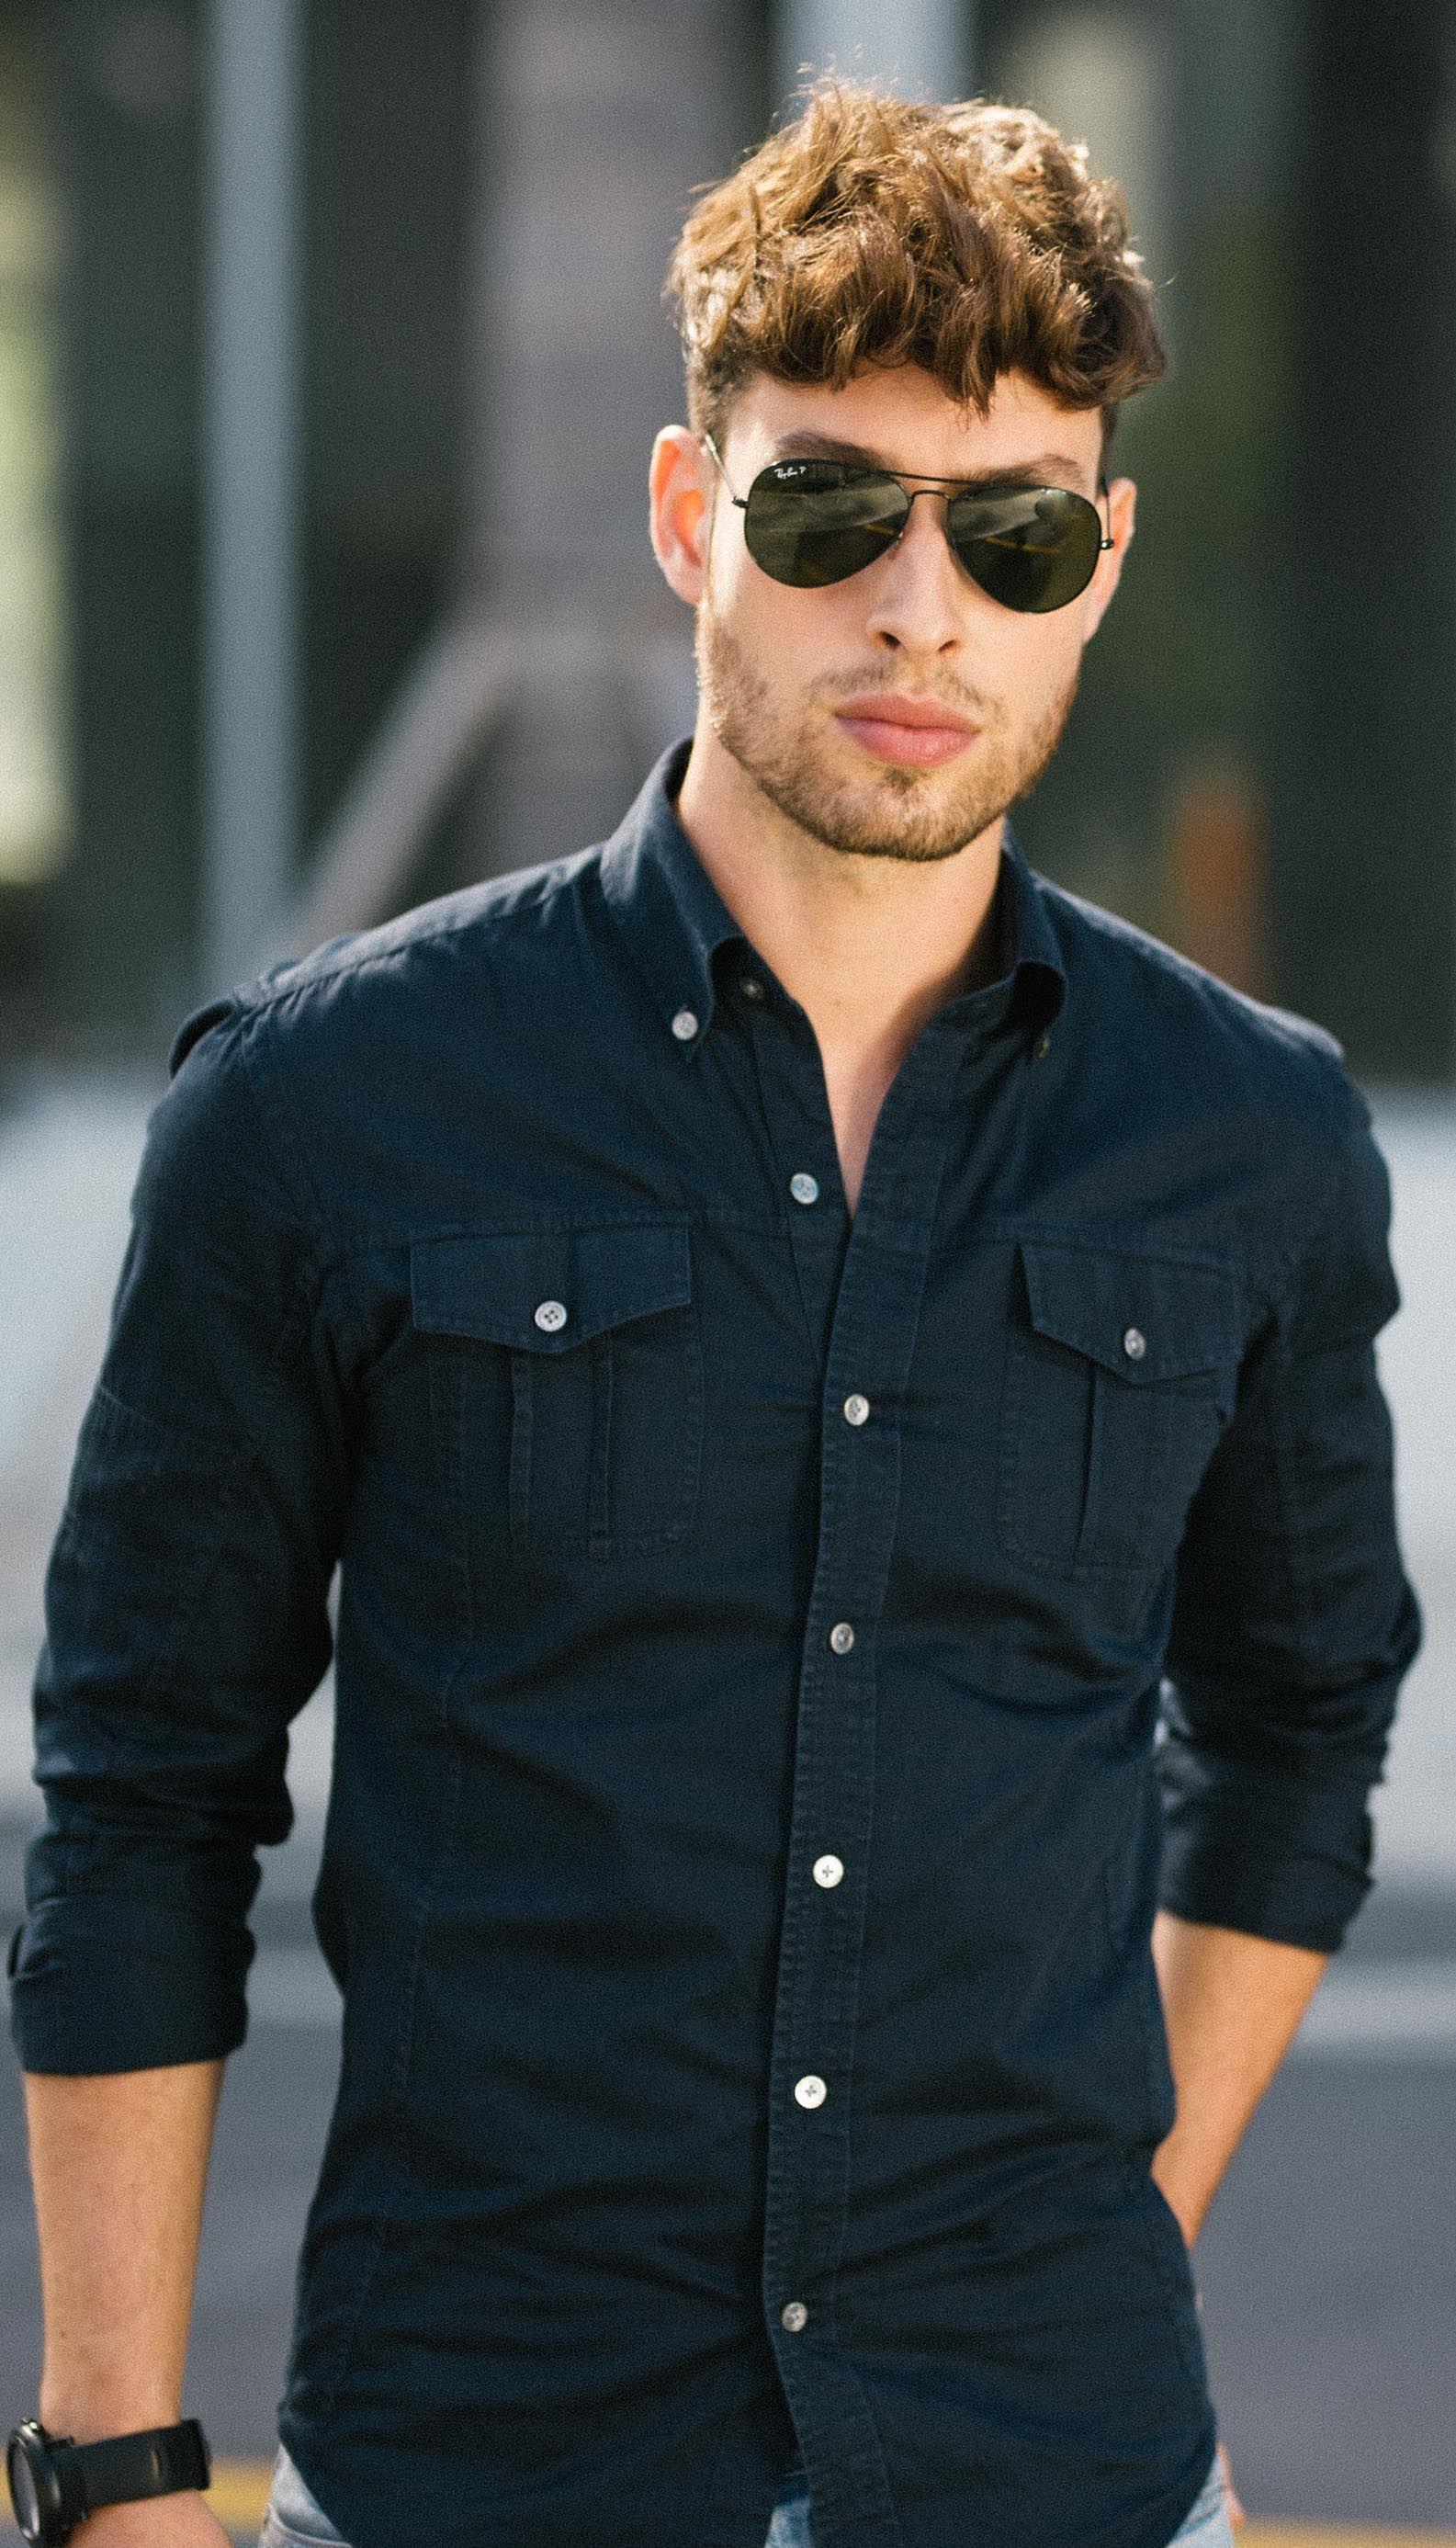 Men S Fitted Utility Shirt Stylish Men Casual Fashion Suits For Men Men Shirt Style [ 2773 x 1585 Pixel ]